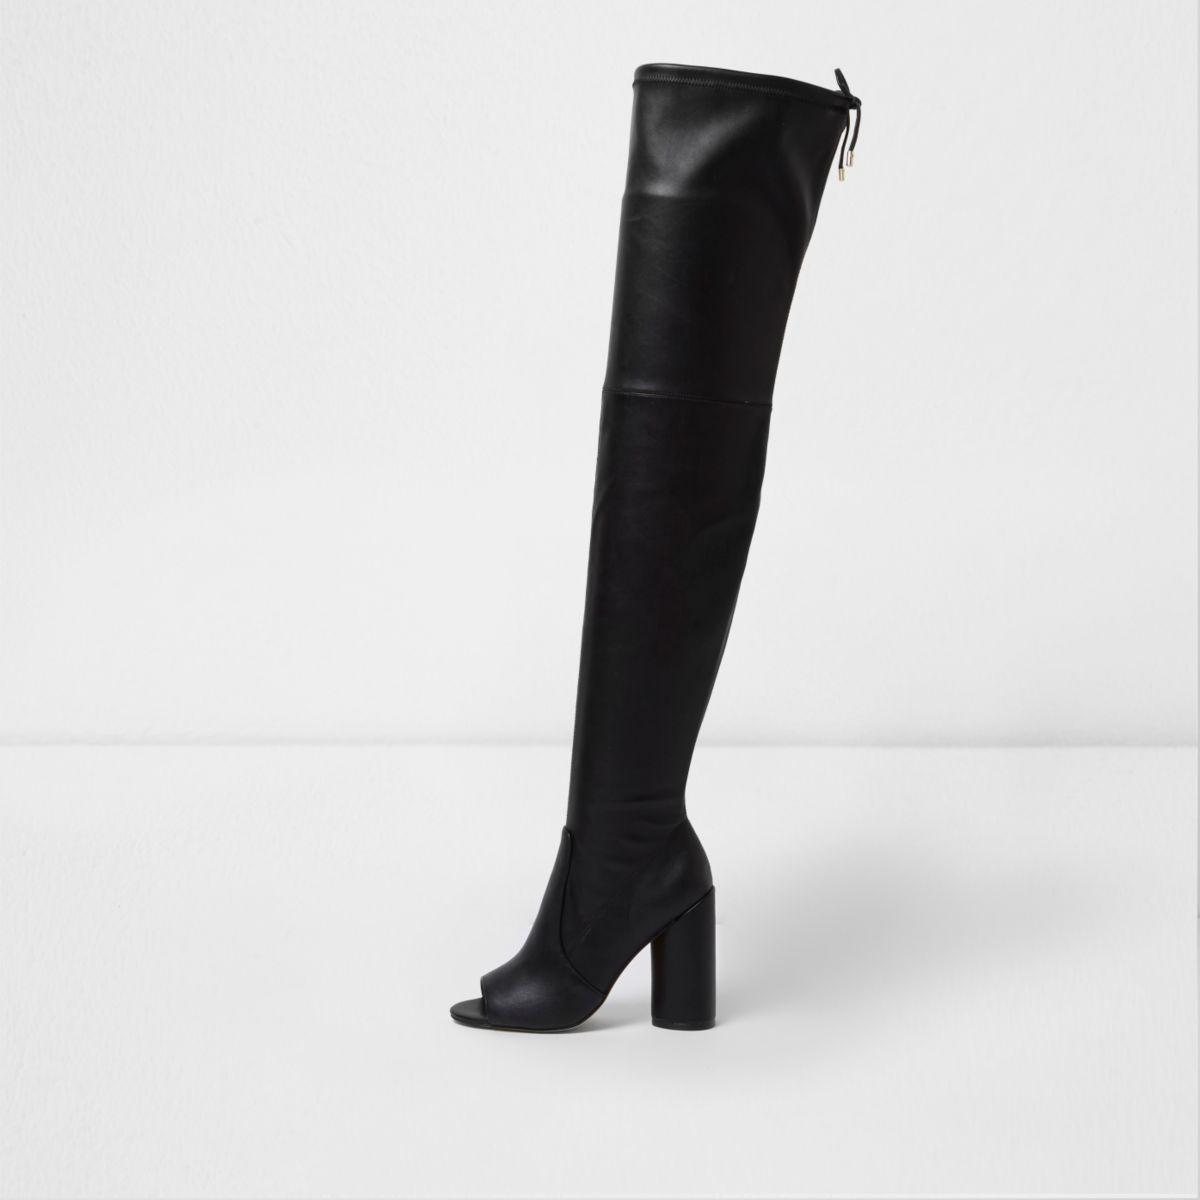 Black over-the-knee peep toe boots